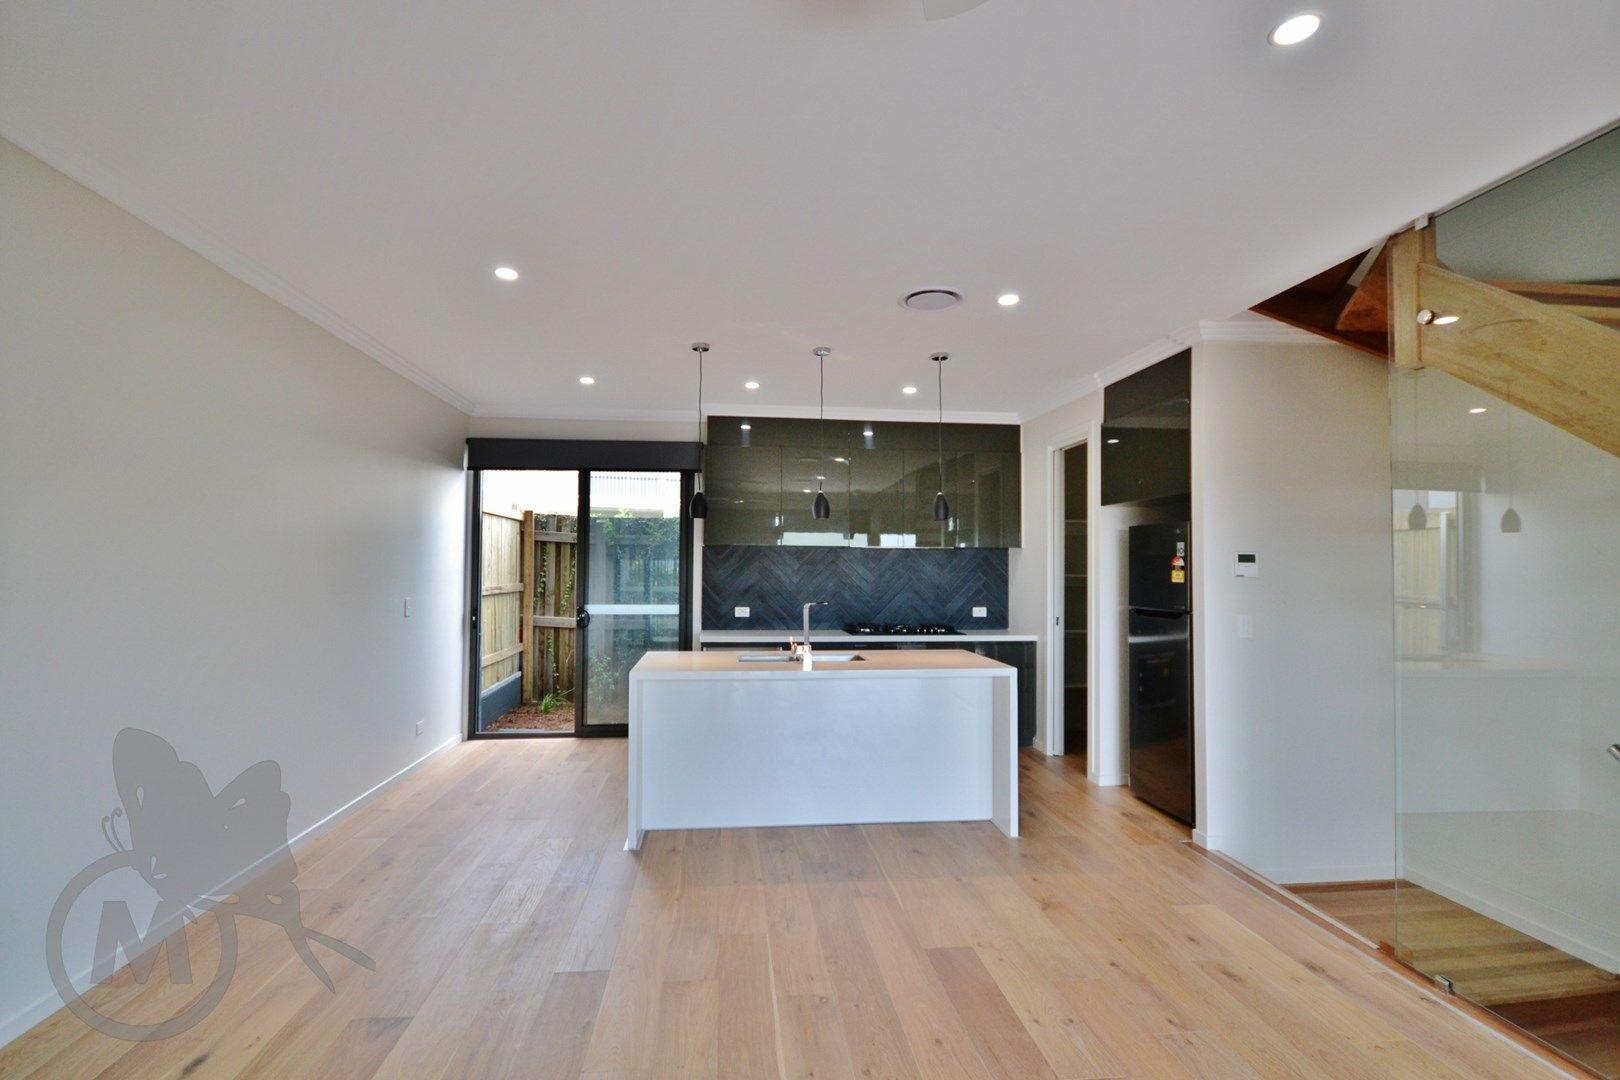 6/89 Herston Rd, Kelvin Grove QLD 4059, Image 0